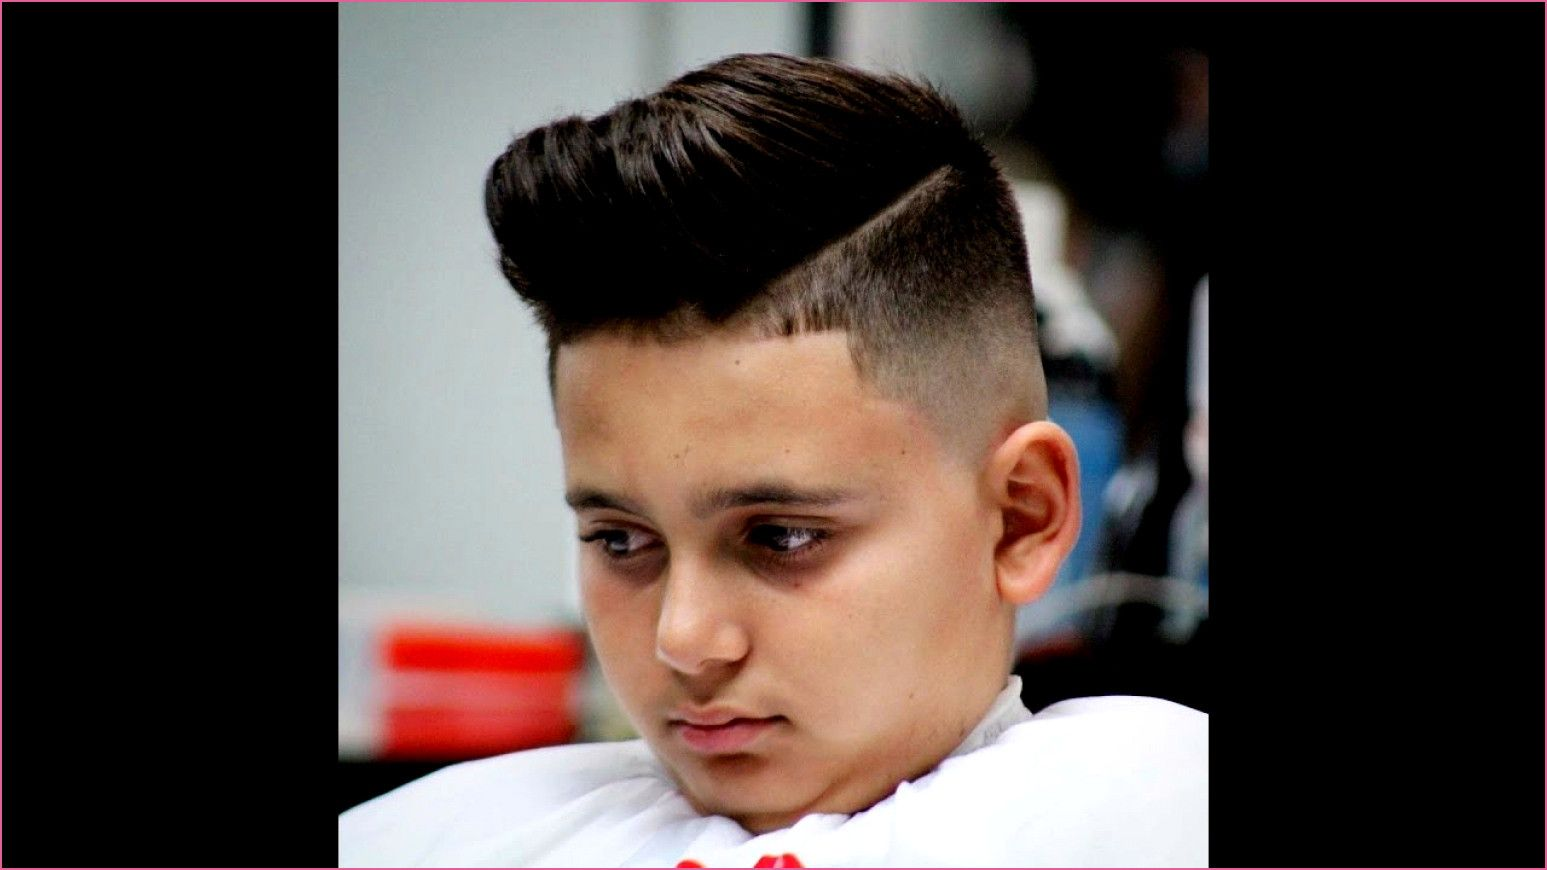 Frisuren Teenager Jungs Jungs Frisuren Susse Frisuren Frisuren